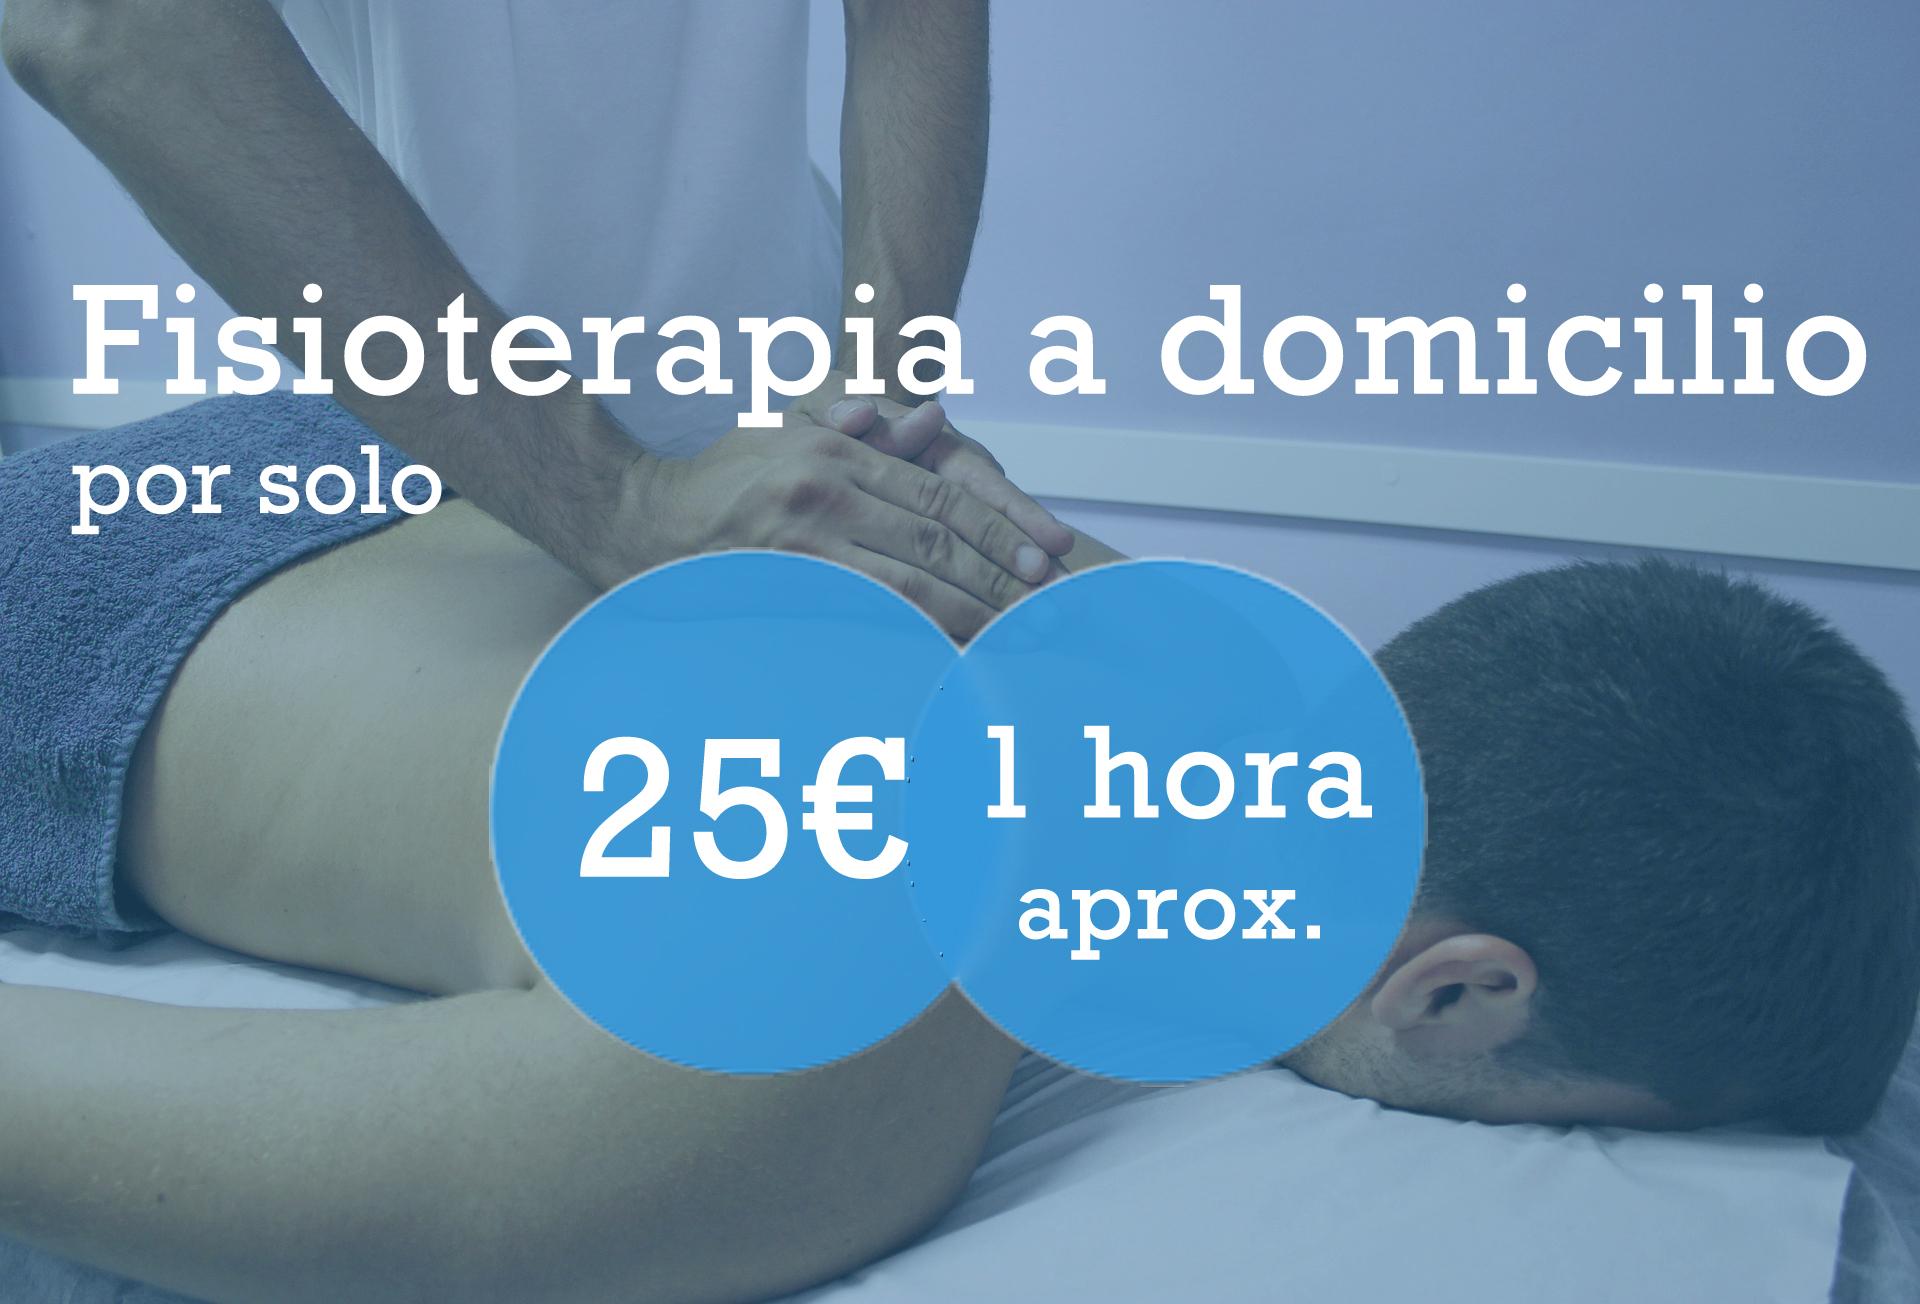 Fisioterapia a domicilio por solo 25€. Sesión de 1 hora aproximadamente.